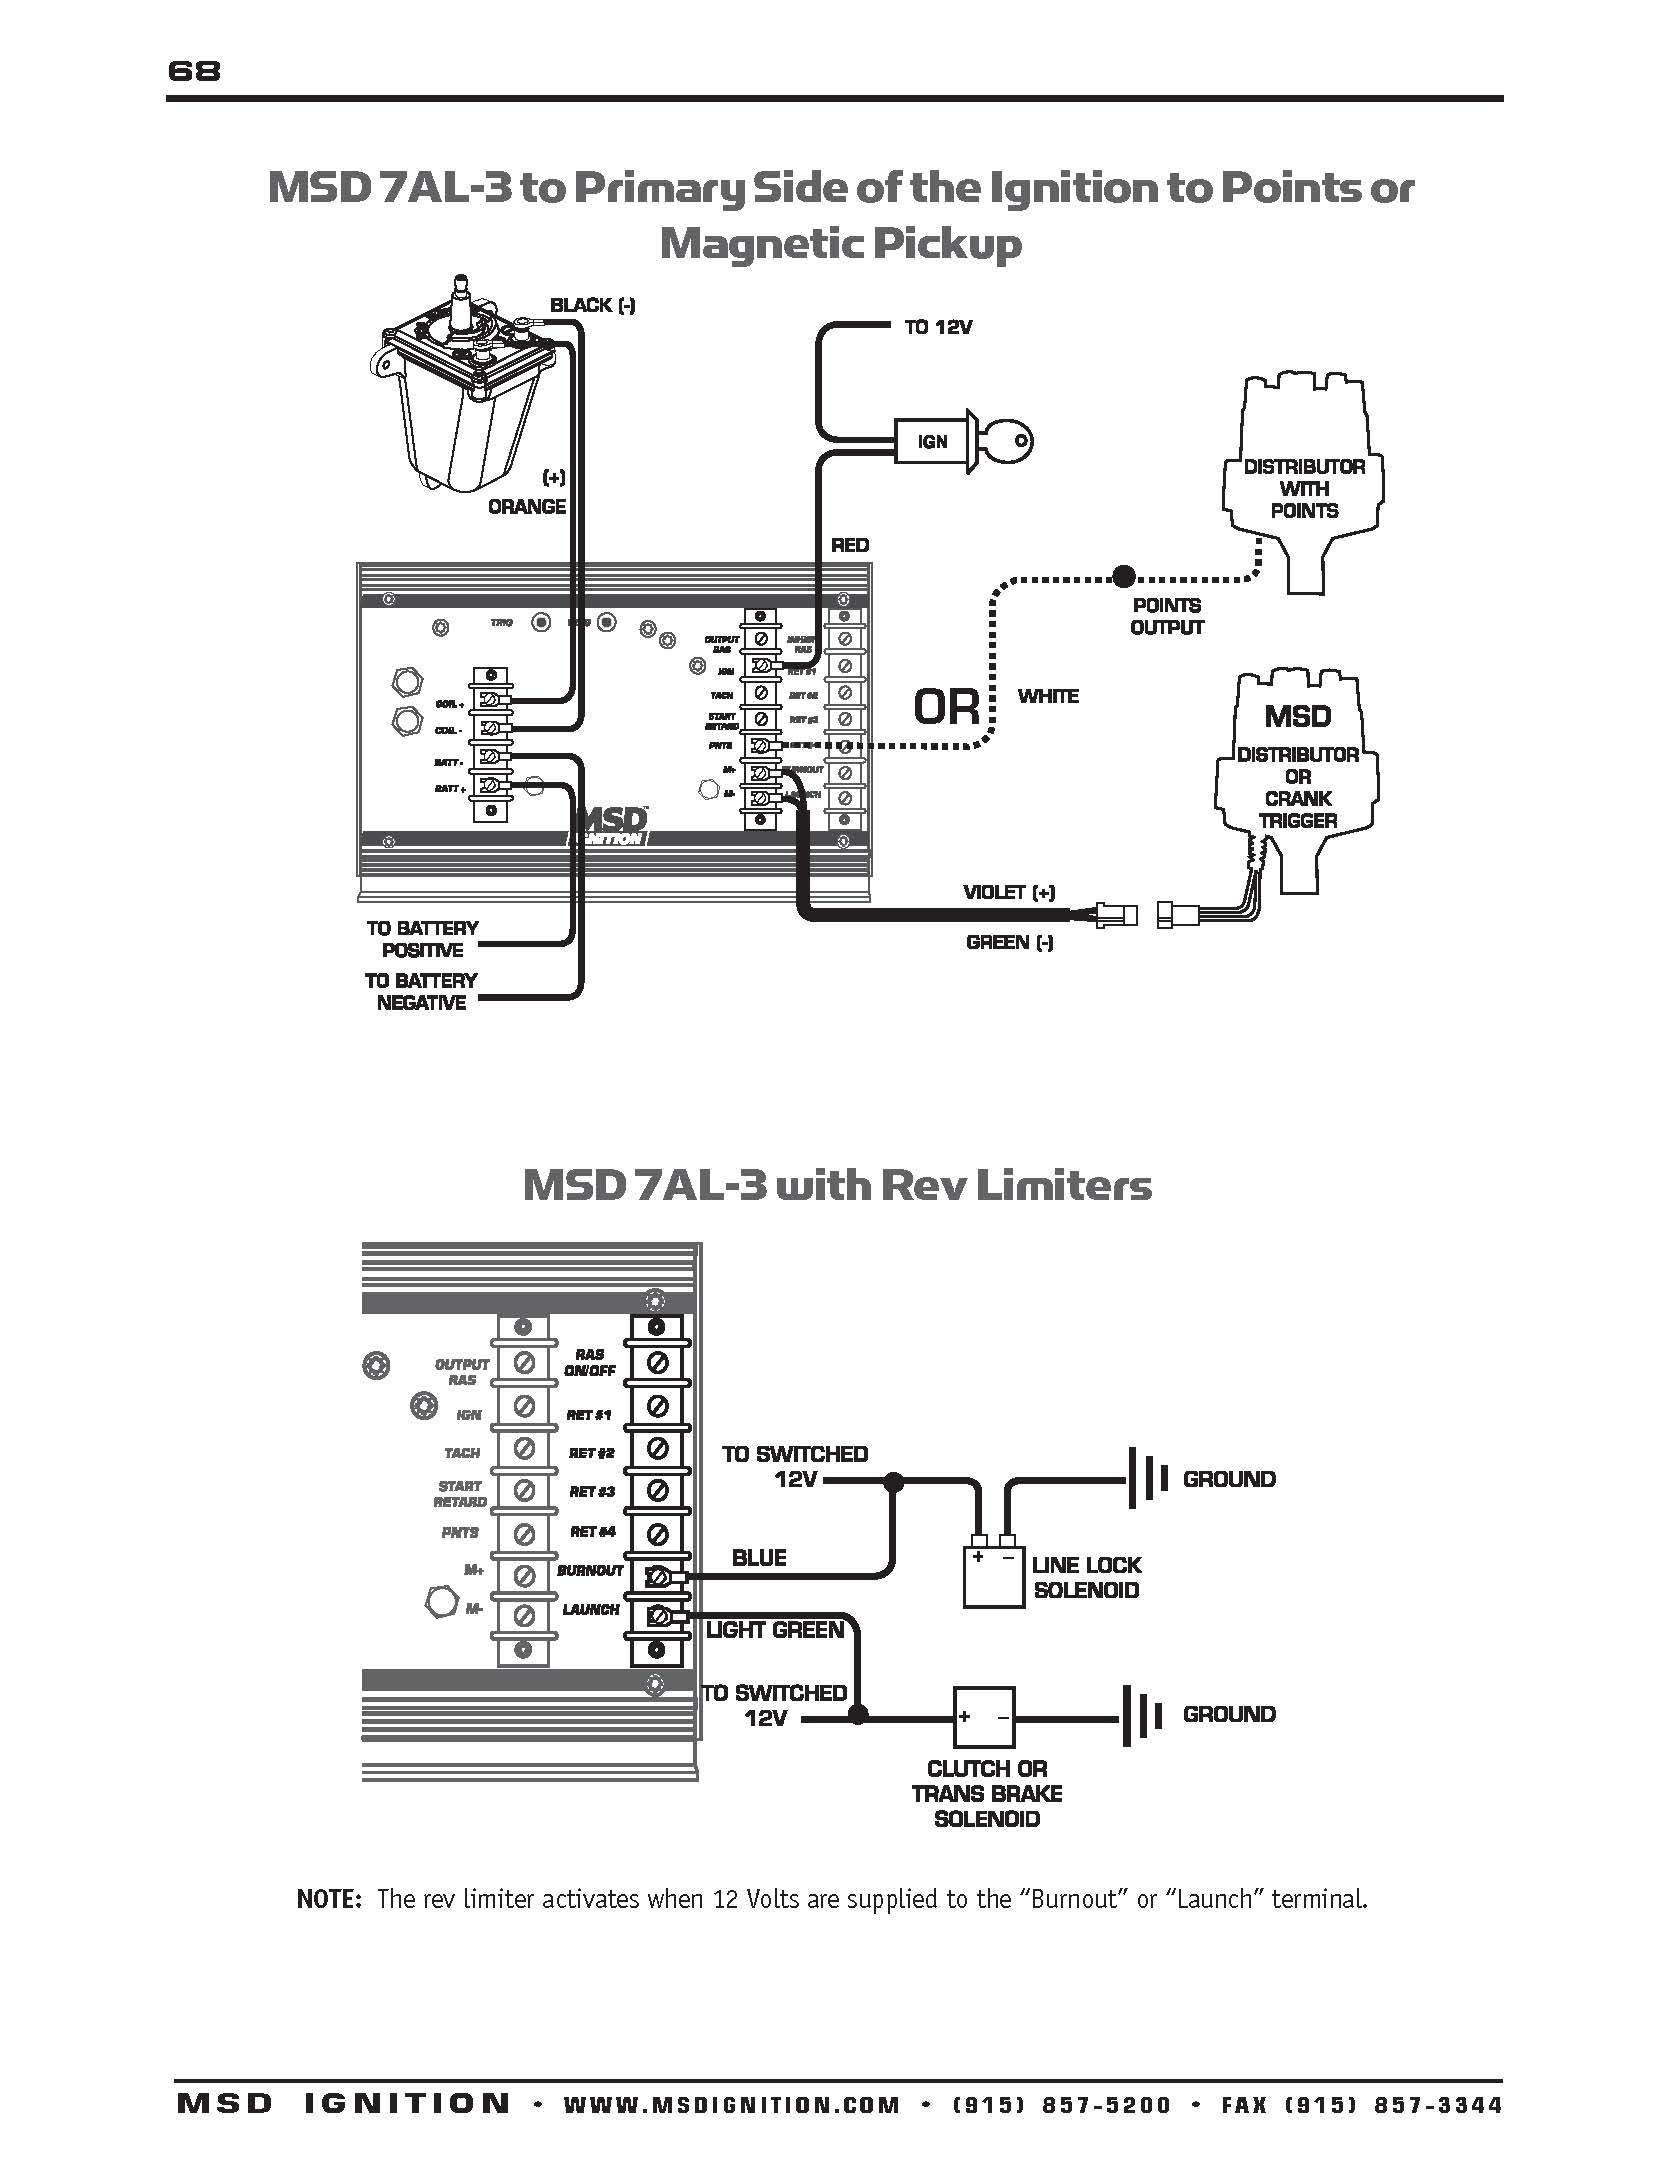 hight resolution of msd 7al 3 wiring diagram chevy wiring diagram online chevy heimsd 7al 3 wiring diagram chevy